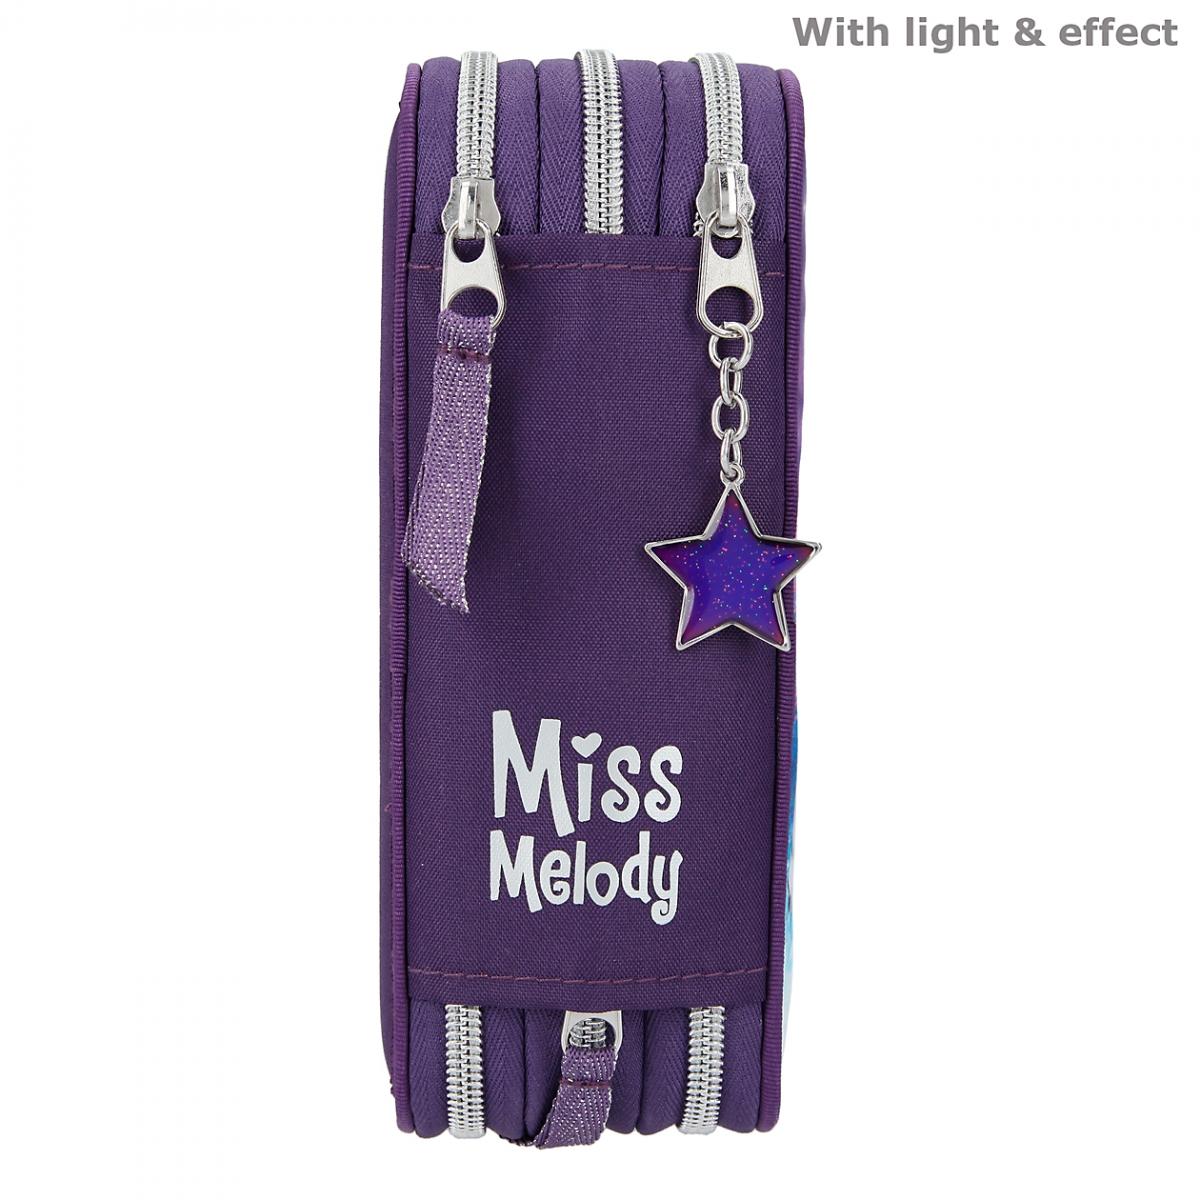 ,Miss melody 3-vaks etui led northern lights